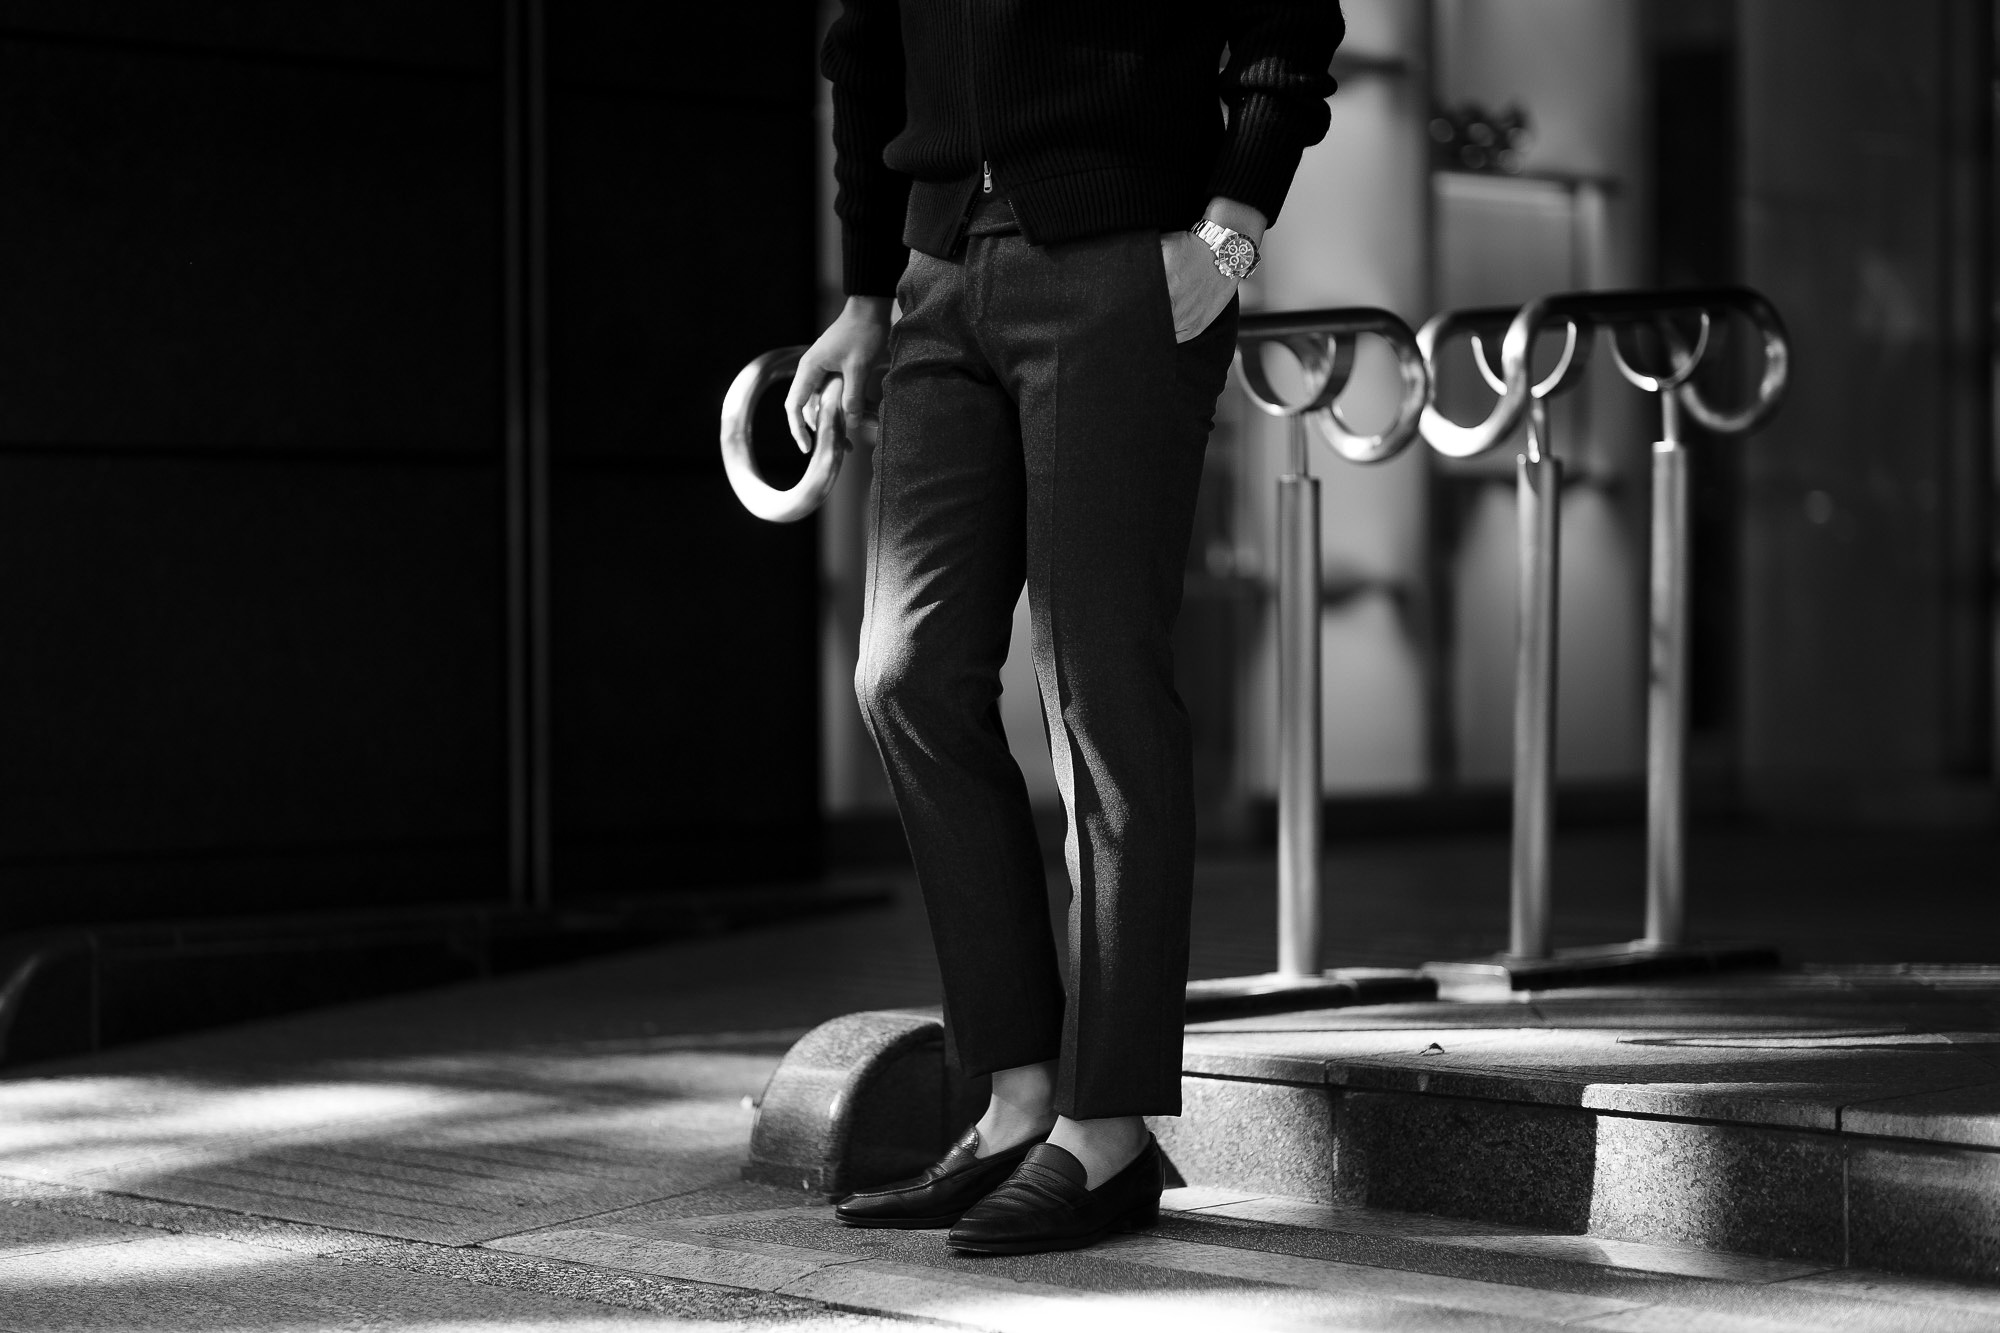 INCOTEX (インコテックス) N35 SLIM FIT (1T0N35) SUPER 100'S WOOLLEN TWILL サージウール スラックス GRAY (グレー・912) 2020 秋冬 【ご予約受付中】愛知 名古屋 altoediritto アルトエデリット